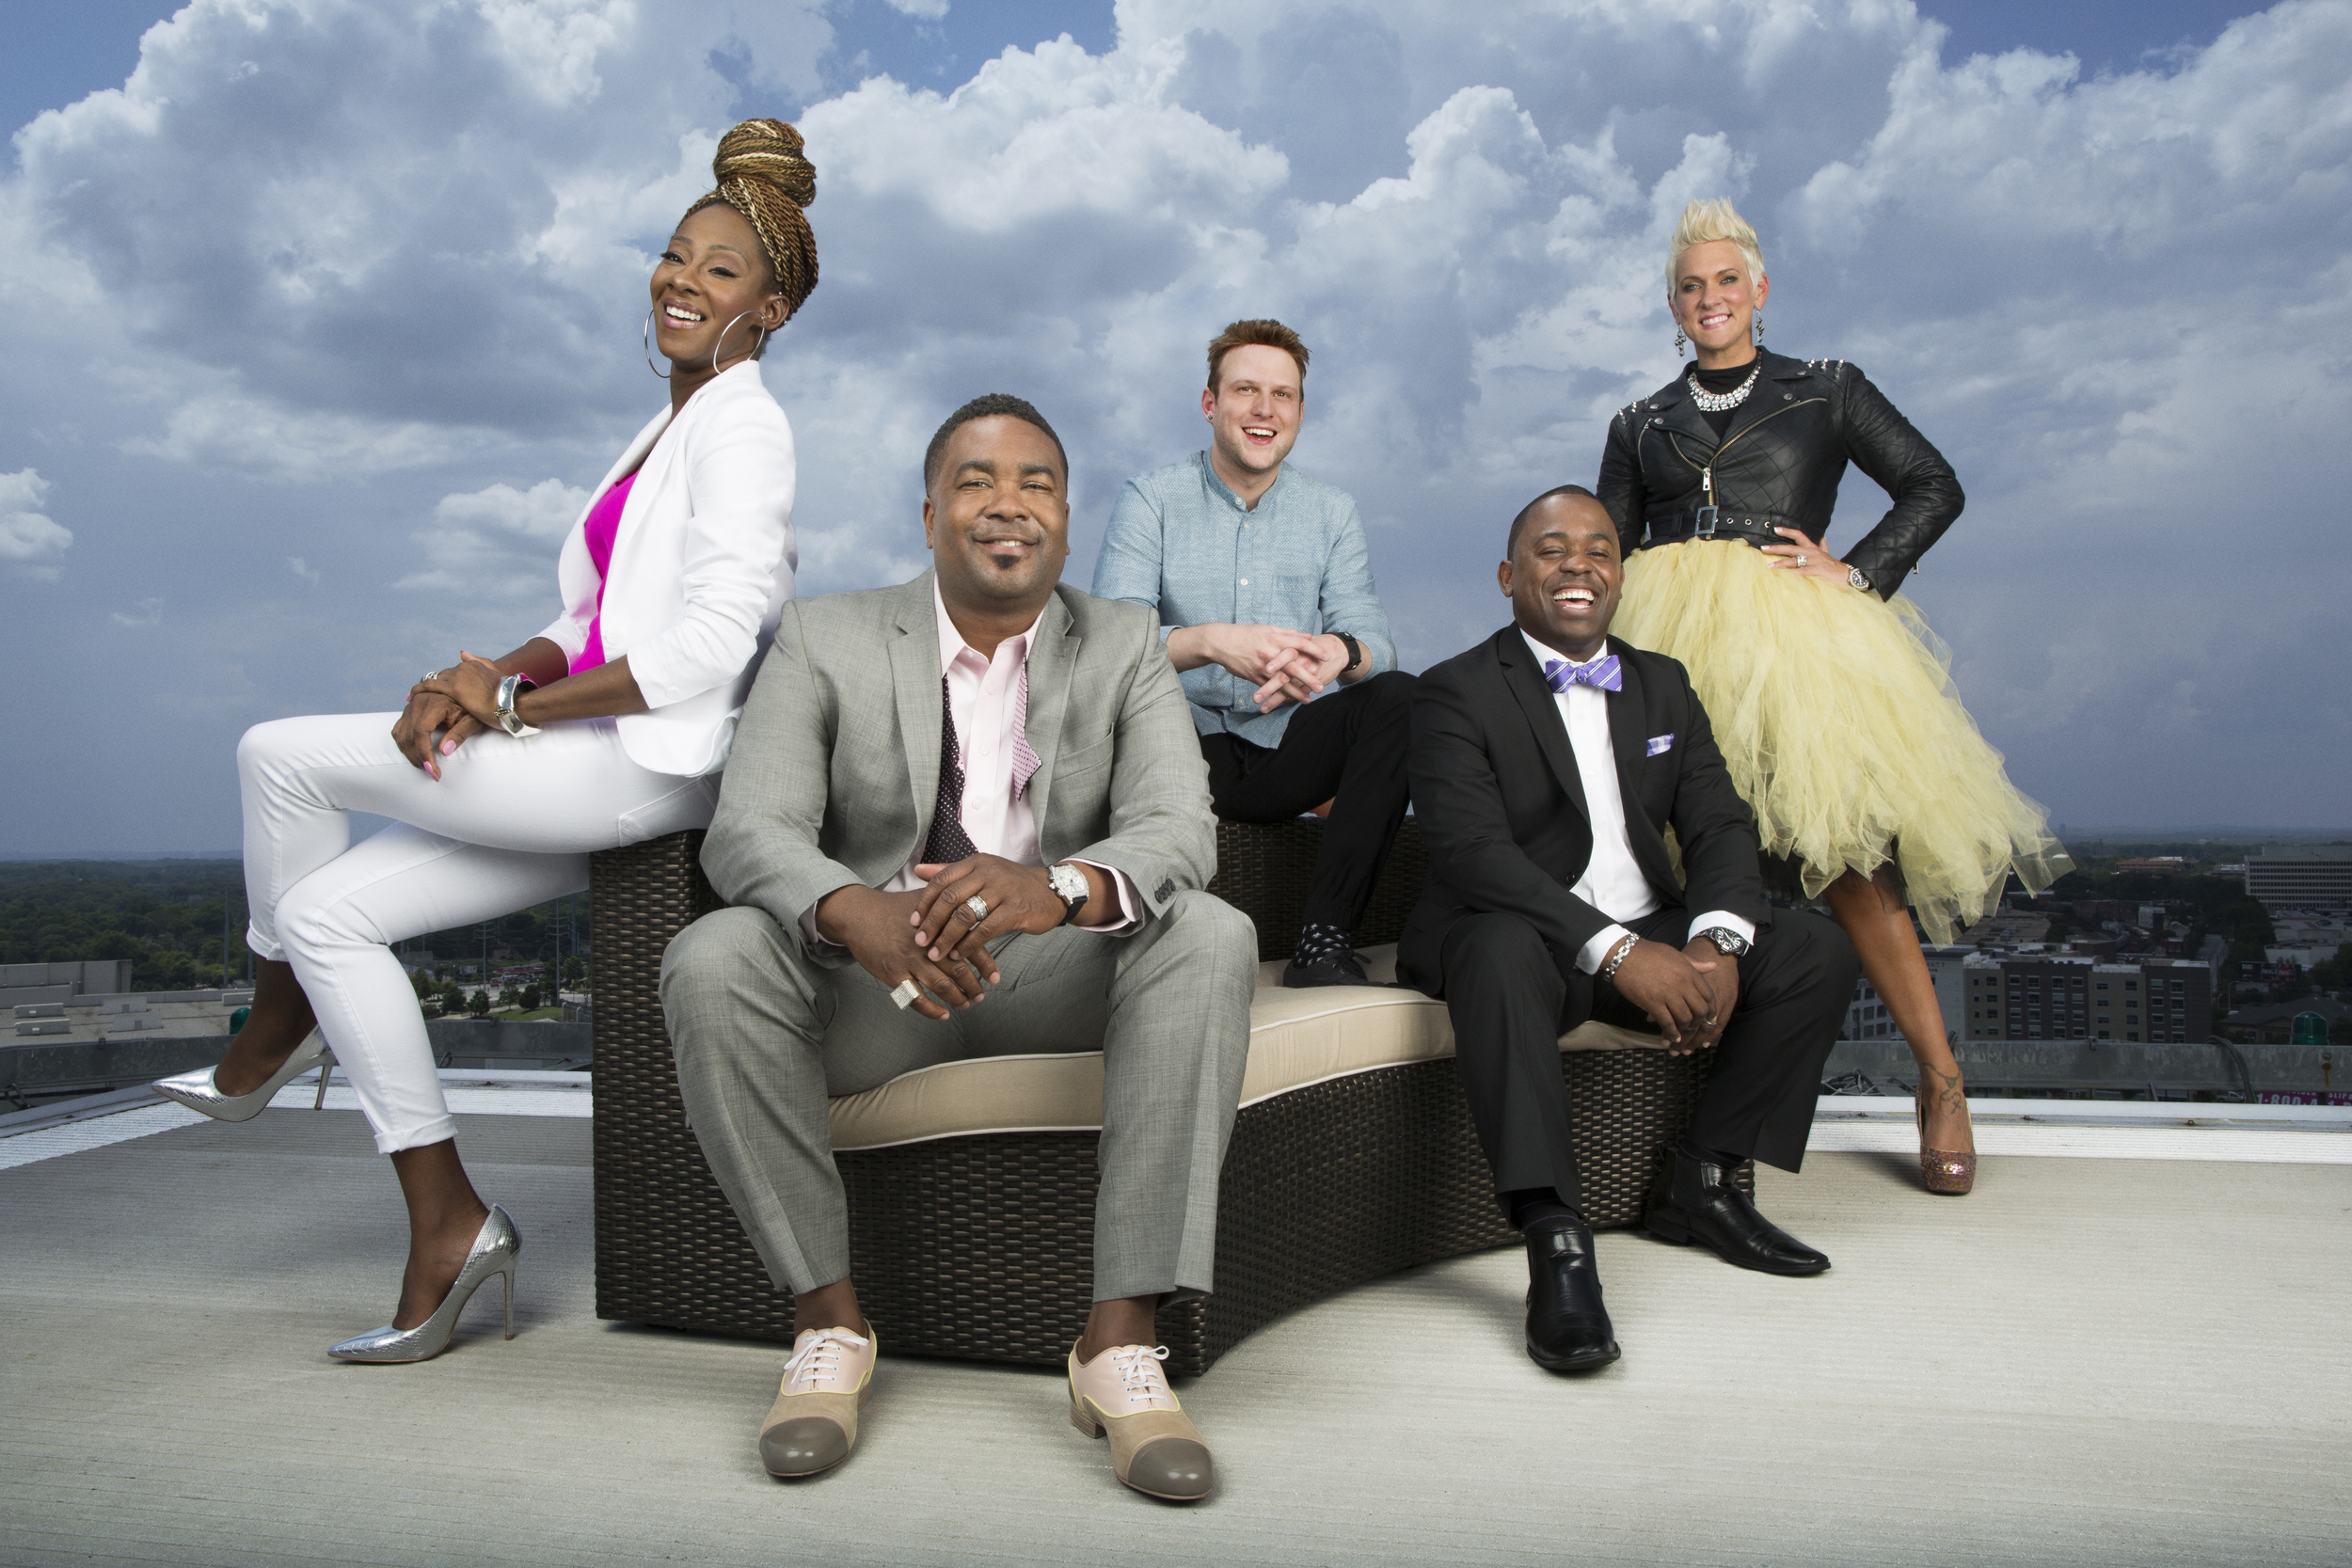 Preachers of Atlanta Cast: (L to R) Pastor Le'Andria Johnson, Pastor Canton Jones,   Pastor Judah Swilley,  Pastor Corey Hambrick, and Pastor Kimberly Jones-Pothier (Oxygen Media)